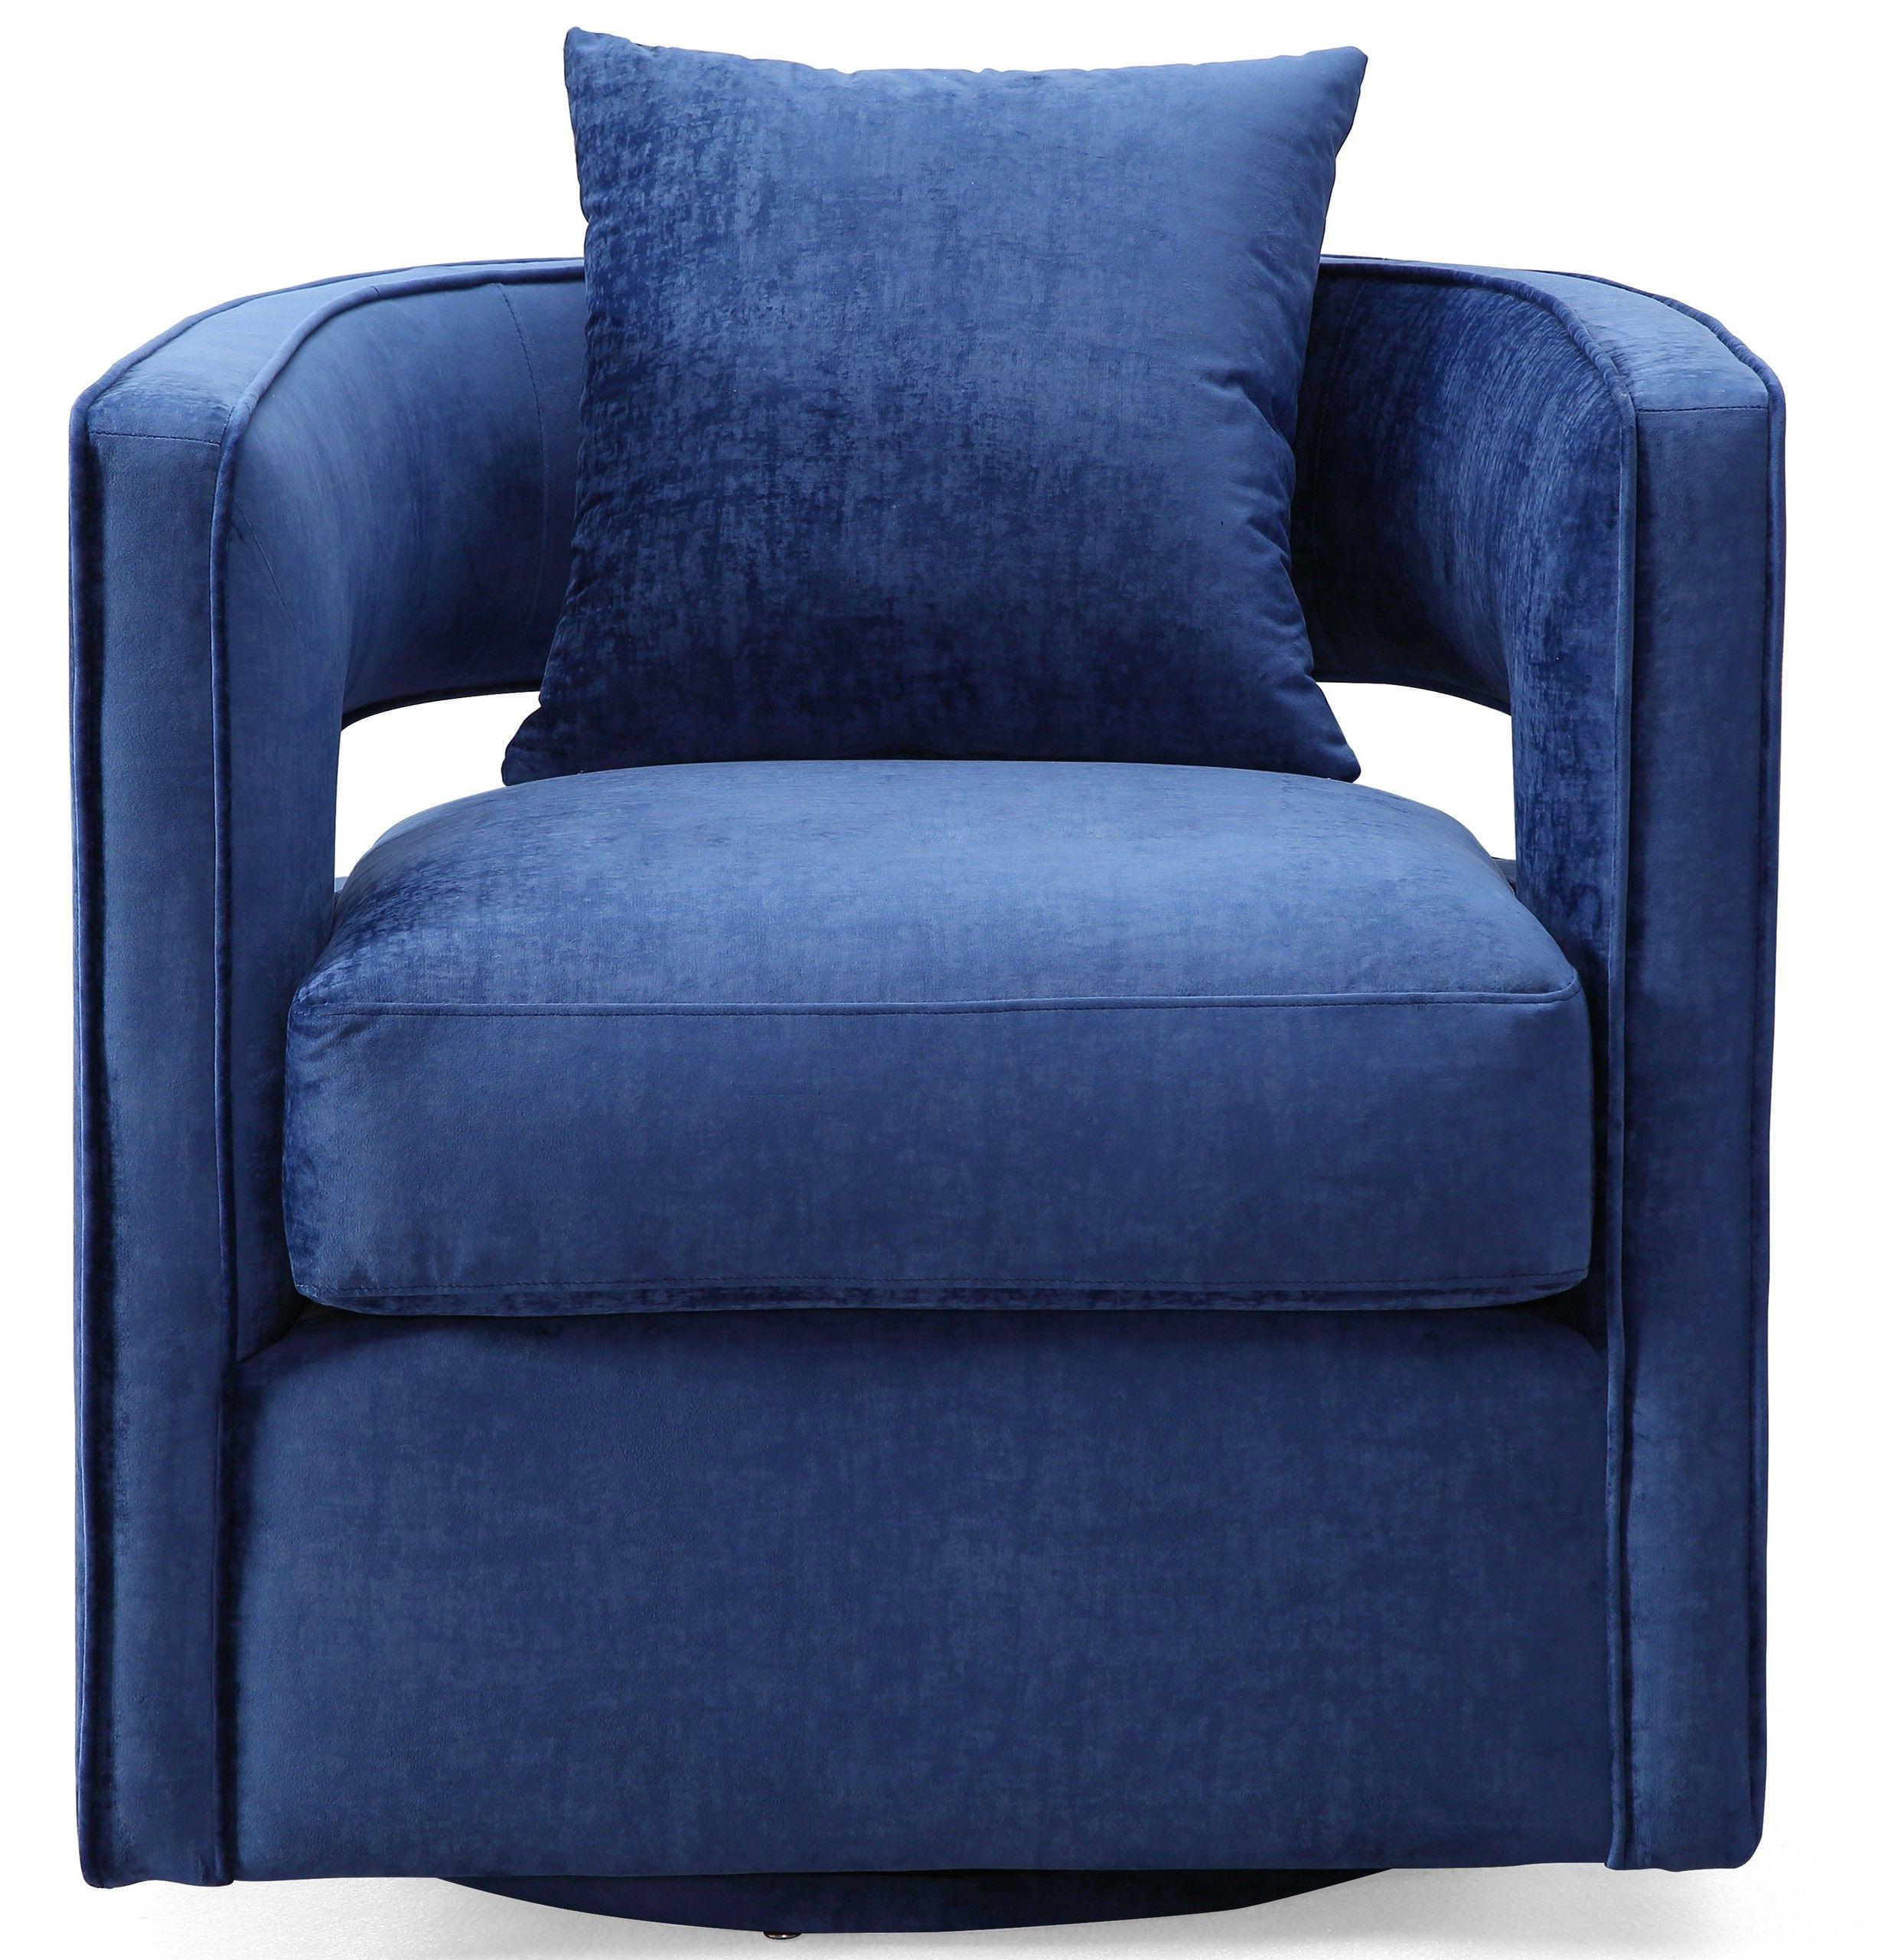 Swell Salvator Velvet Swivel Chair Royal Blue Swivel Swivel Unemploymentrelief Wooden Chair Designs For Living Room Unemploymentrelieforg